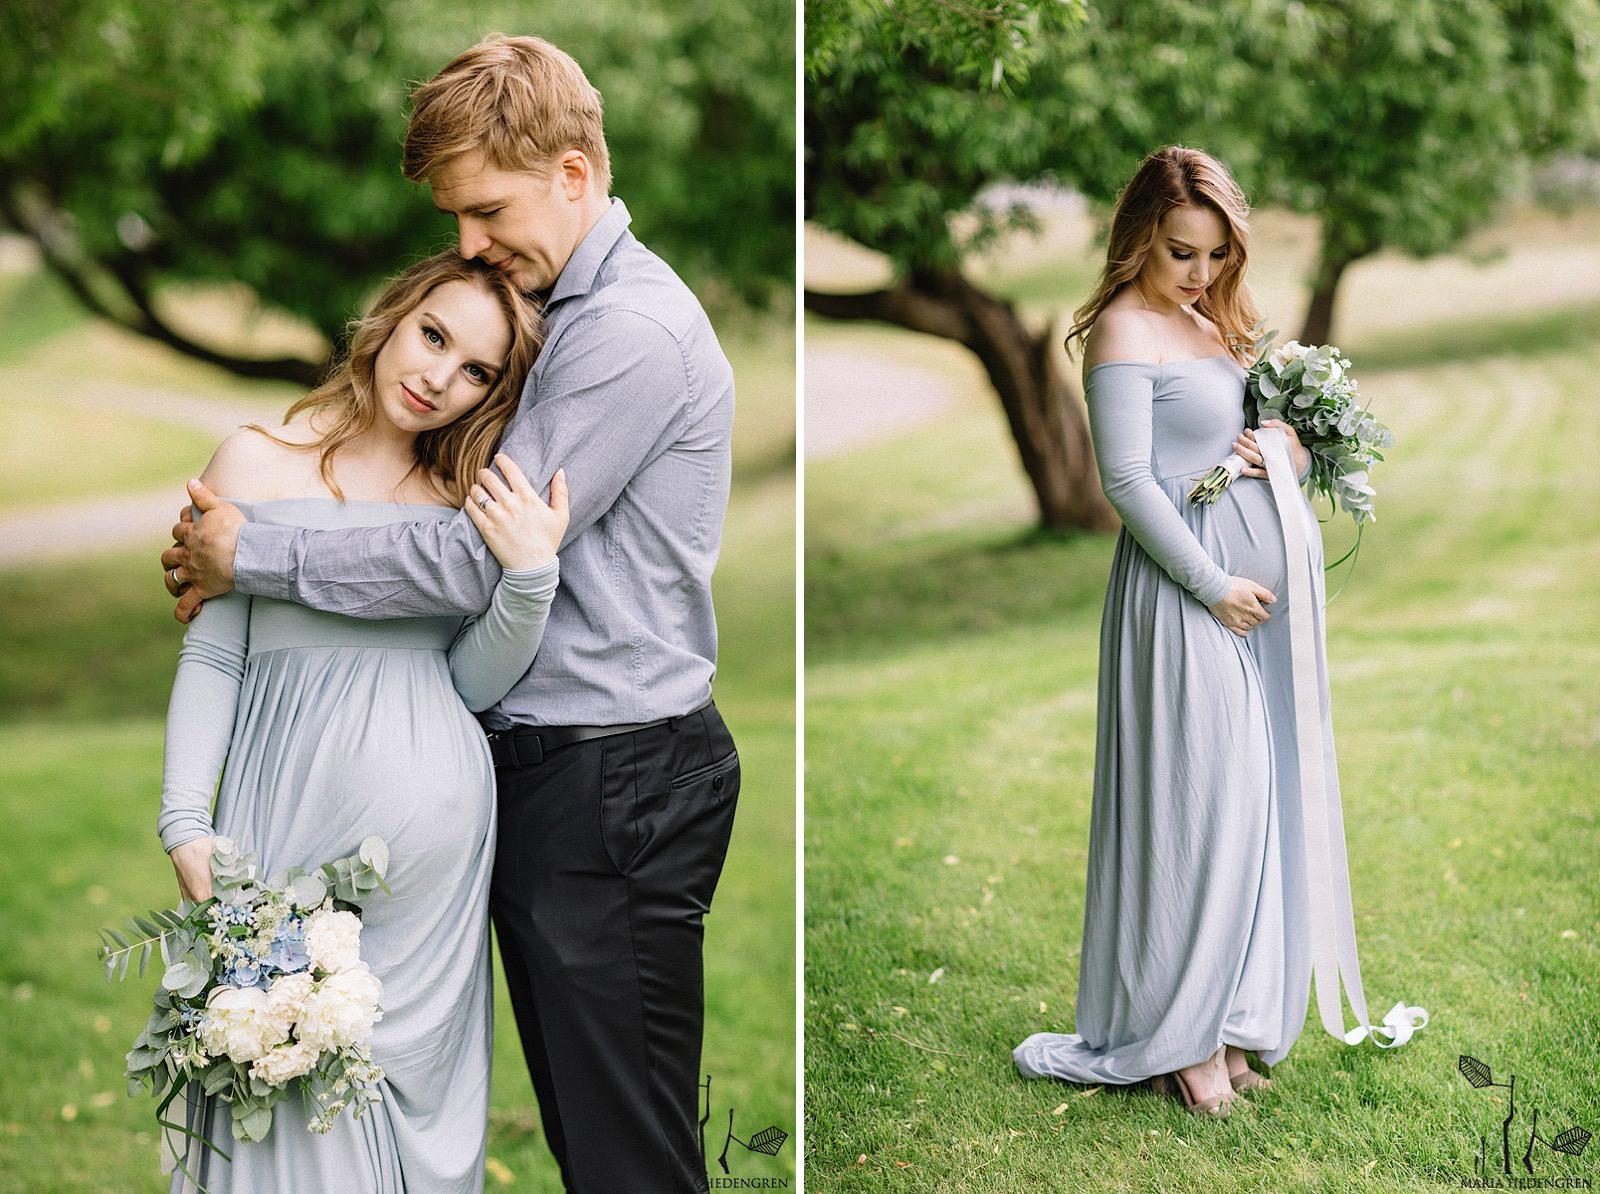 raskausajan kuvaus